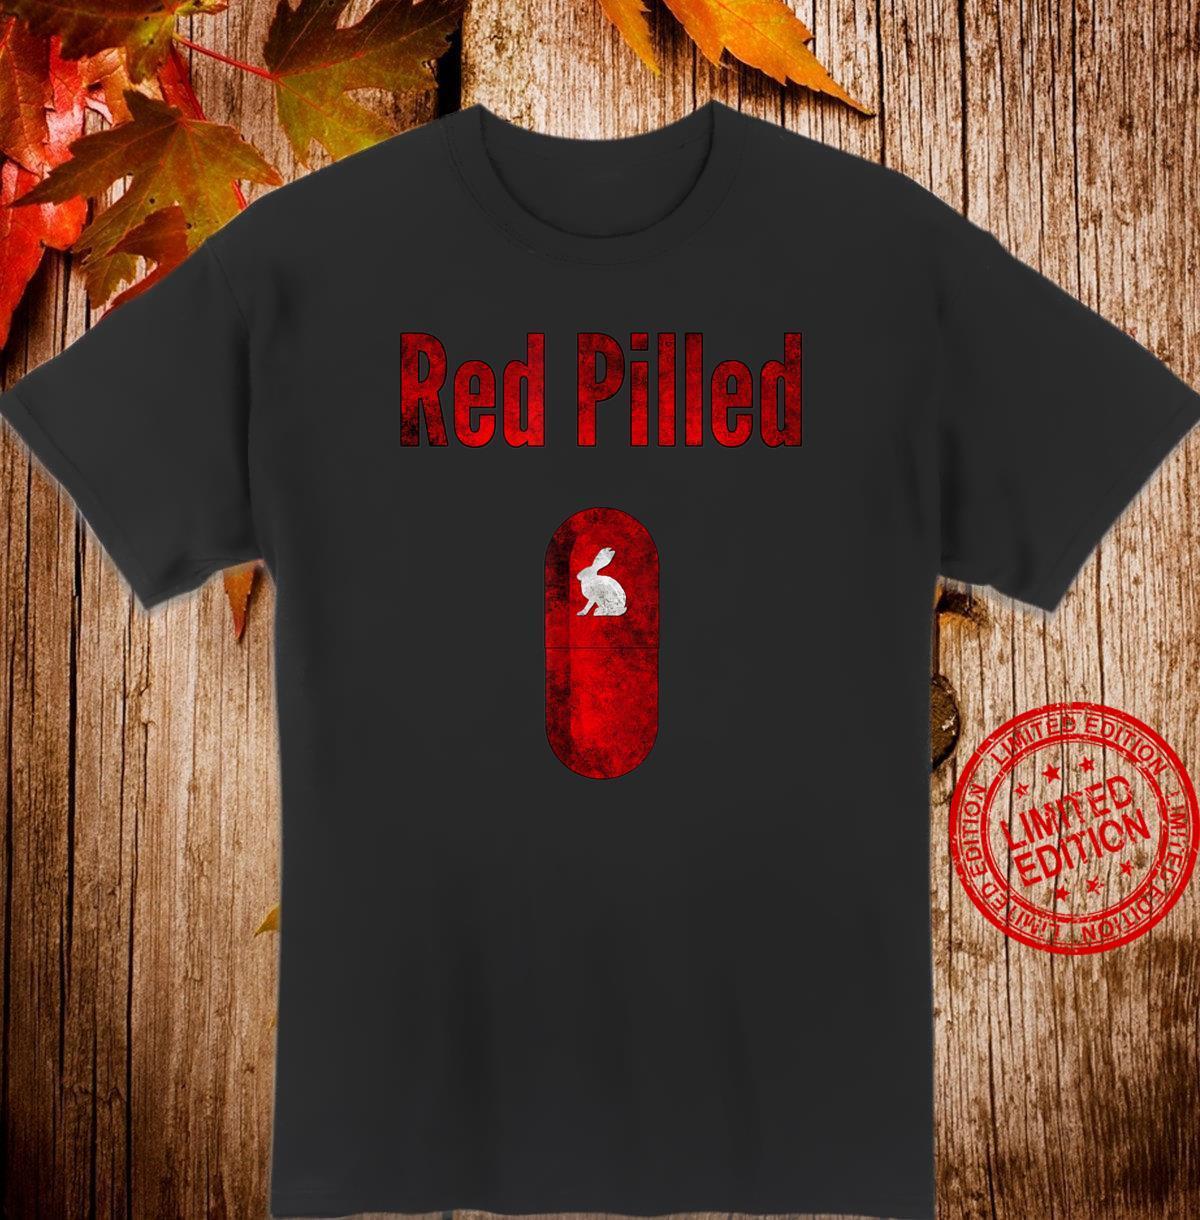 Qanon Q+ Red Pilled Rabbit Shirt